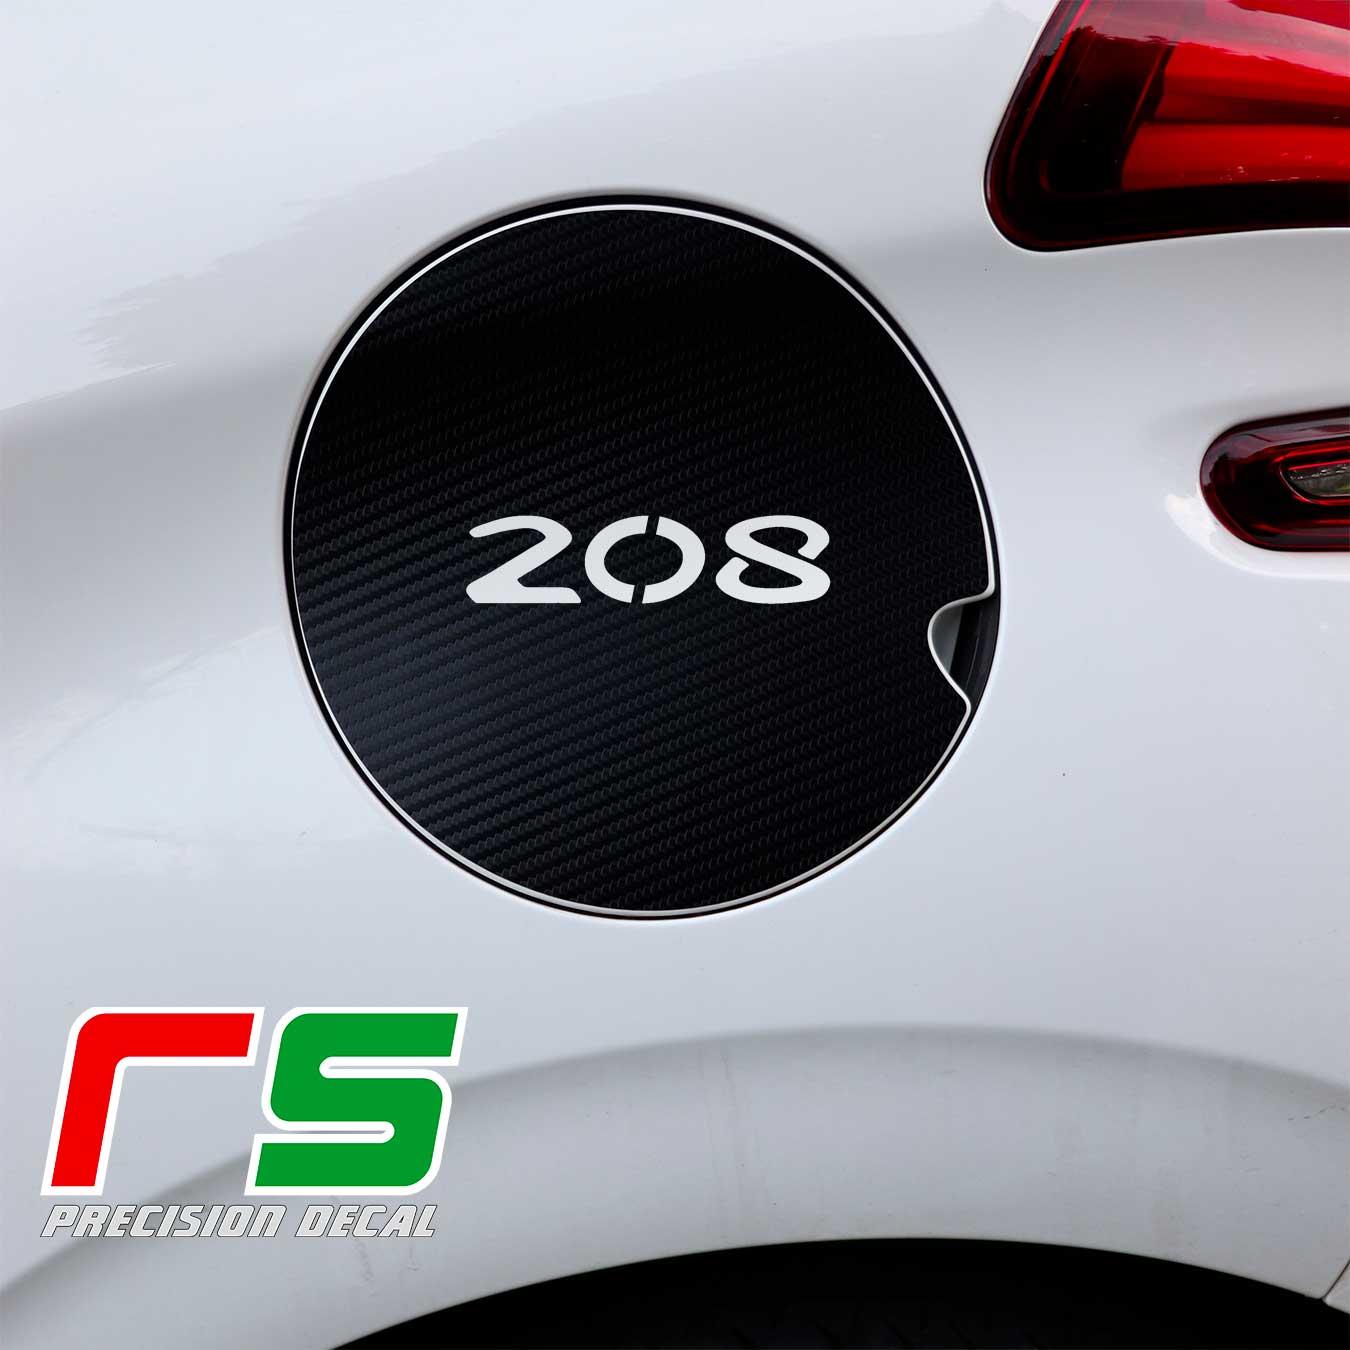 Peugeot 208 tank flap decal carbonlook tuning